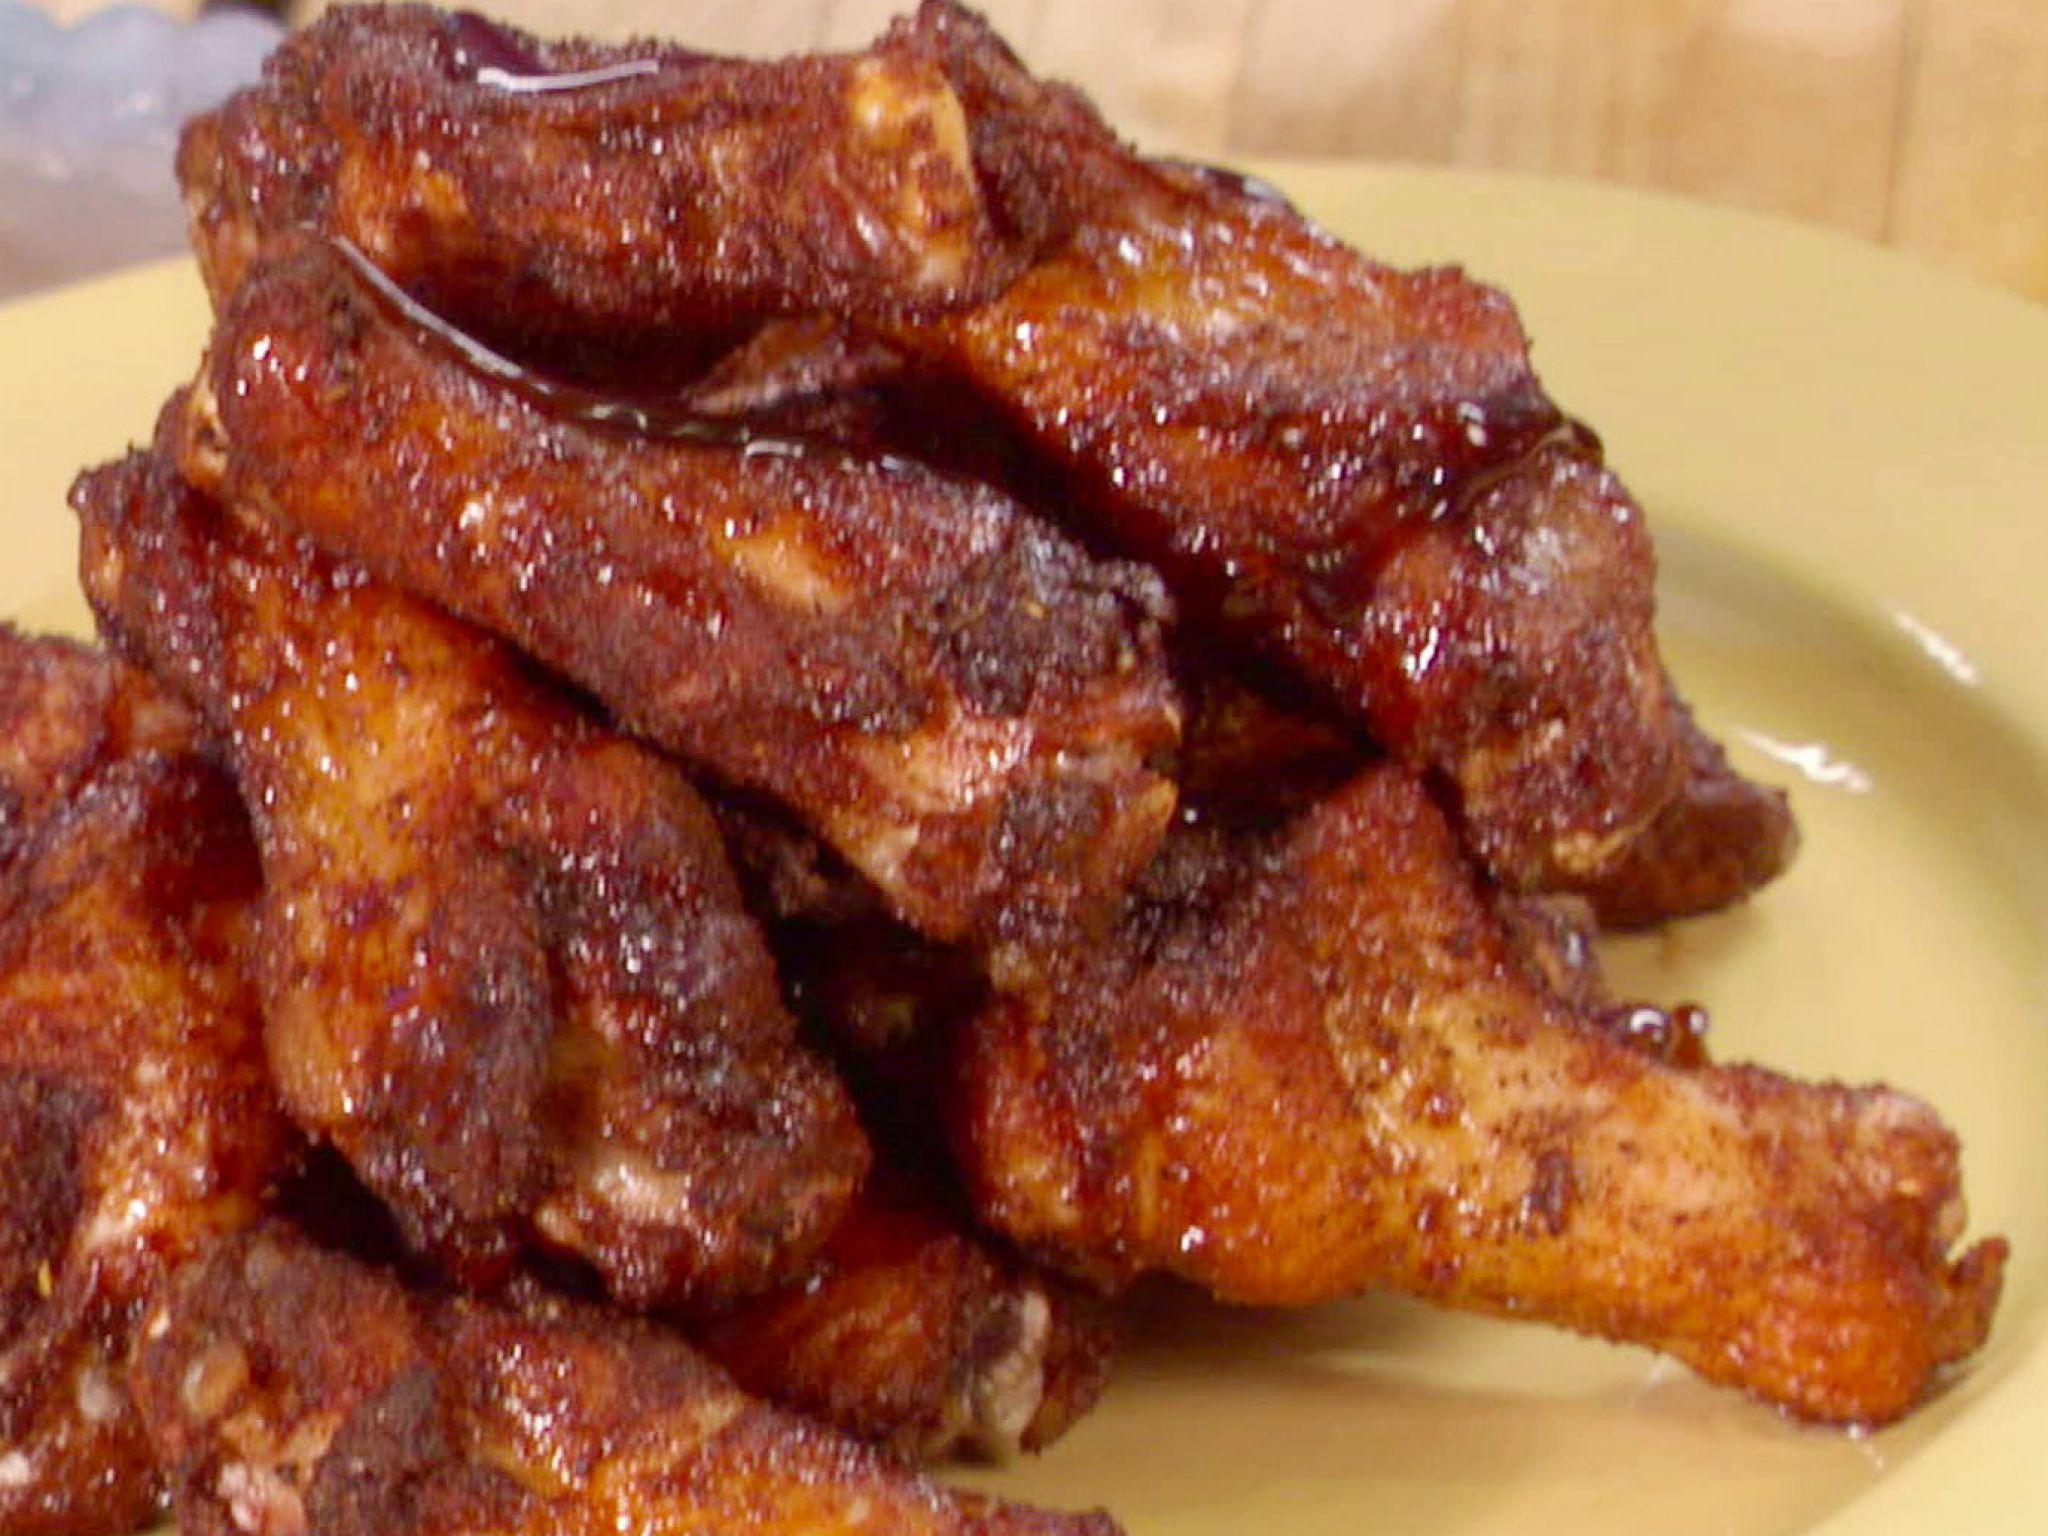 Jerk wings with rum brown sugar glaze recipe brown sugar glaze food forumfinder Image collections